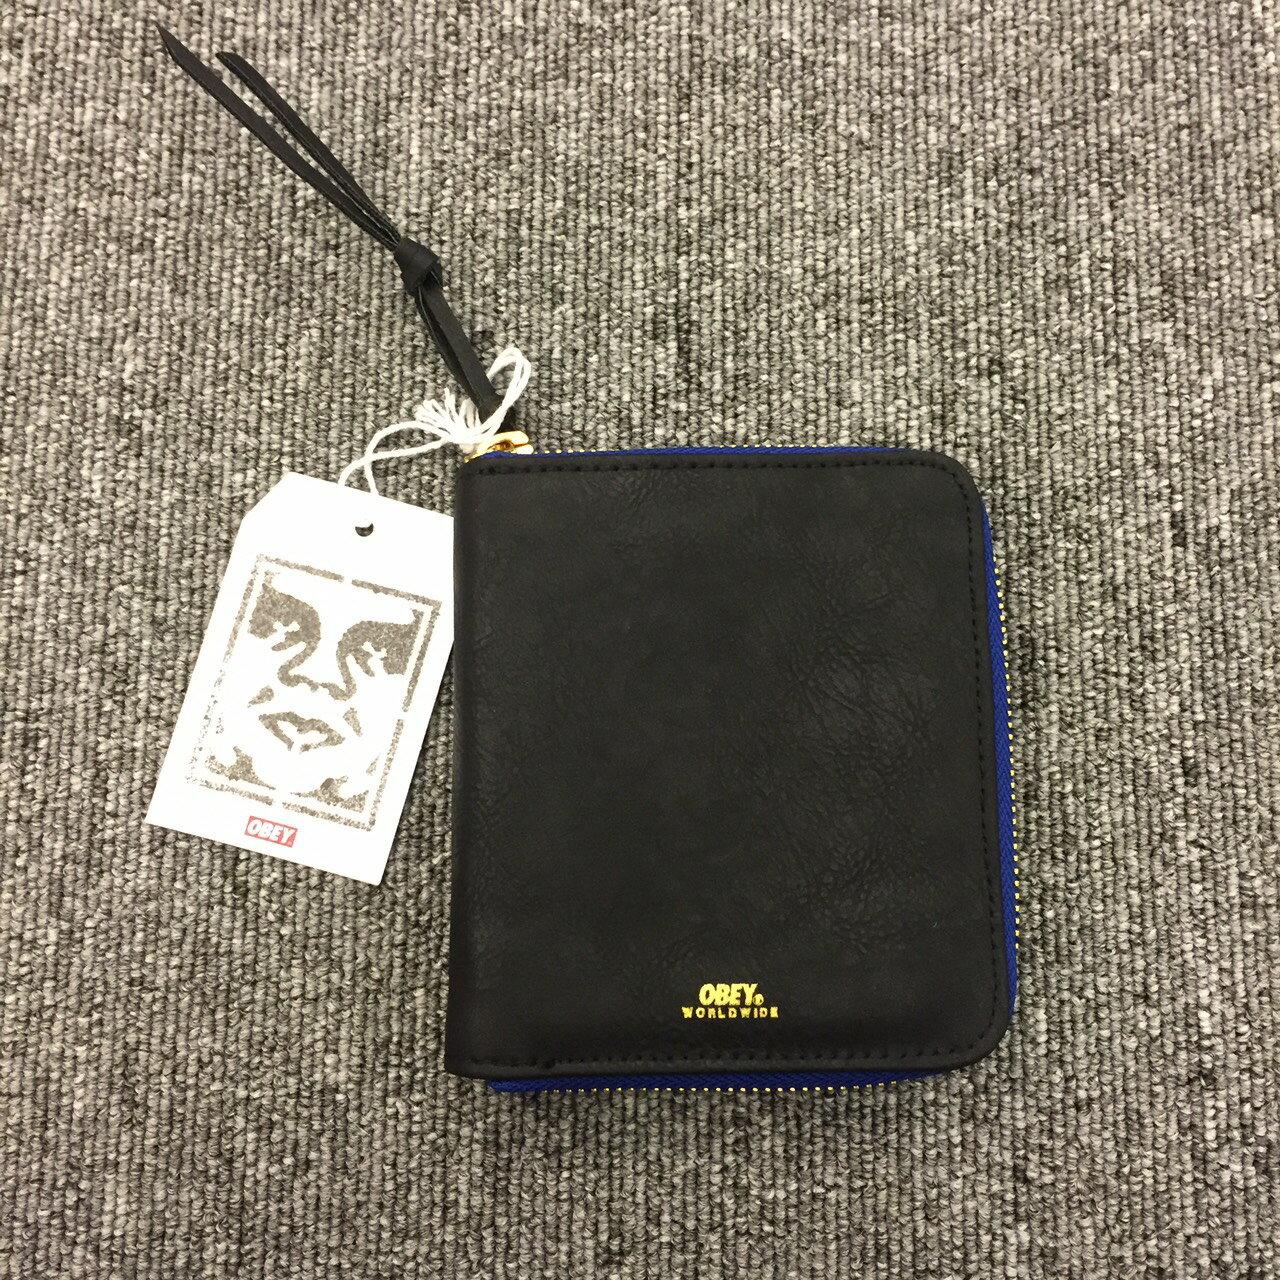 BEETLE 美國品牌 OBEY GENTRY ZIP AROUND WALLET 全黑 藍 卡夾 皮夾 短夾 100310086BLK OB-407 0